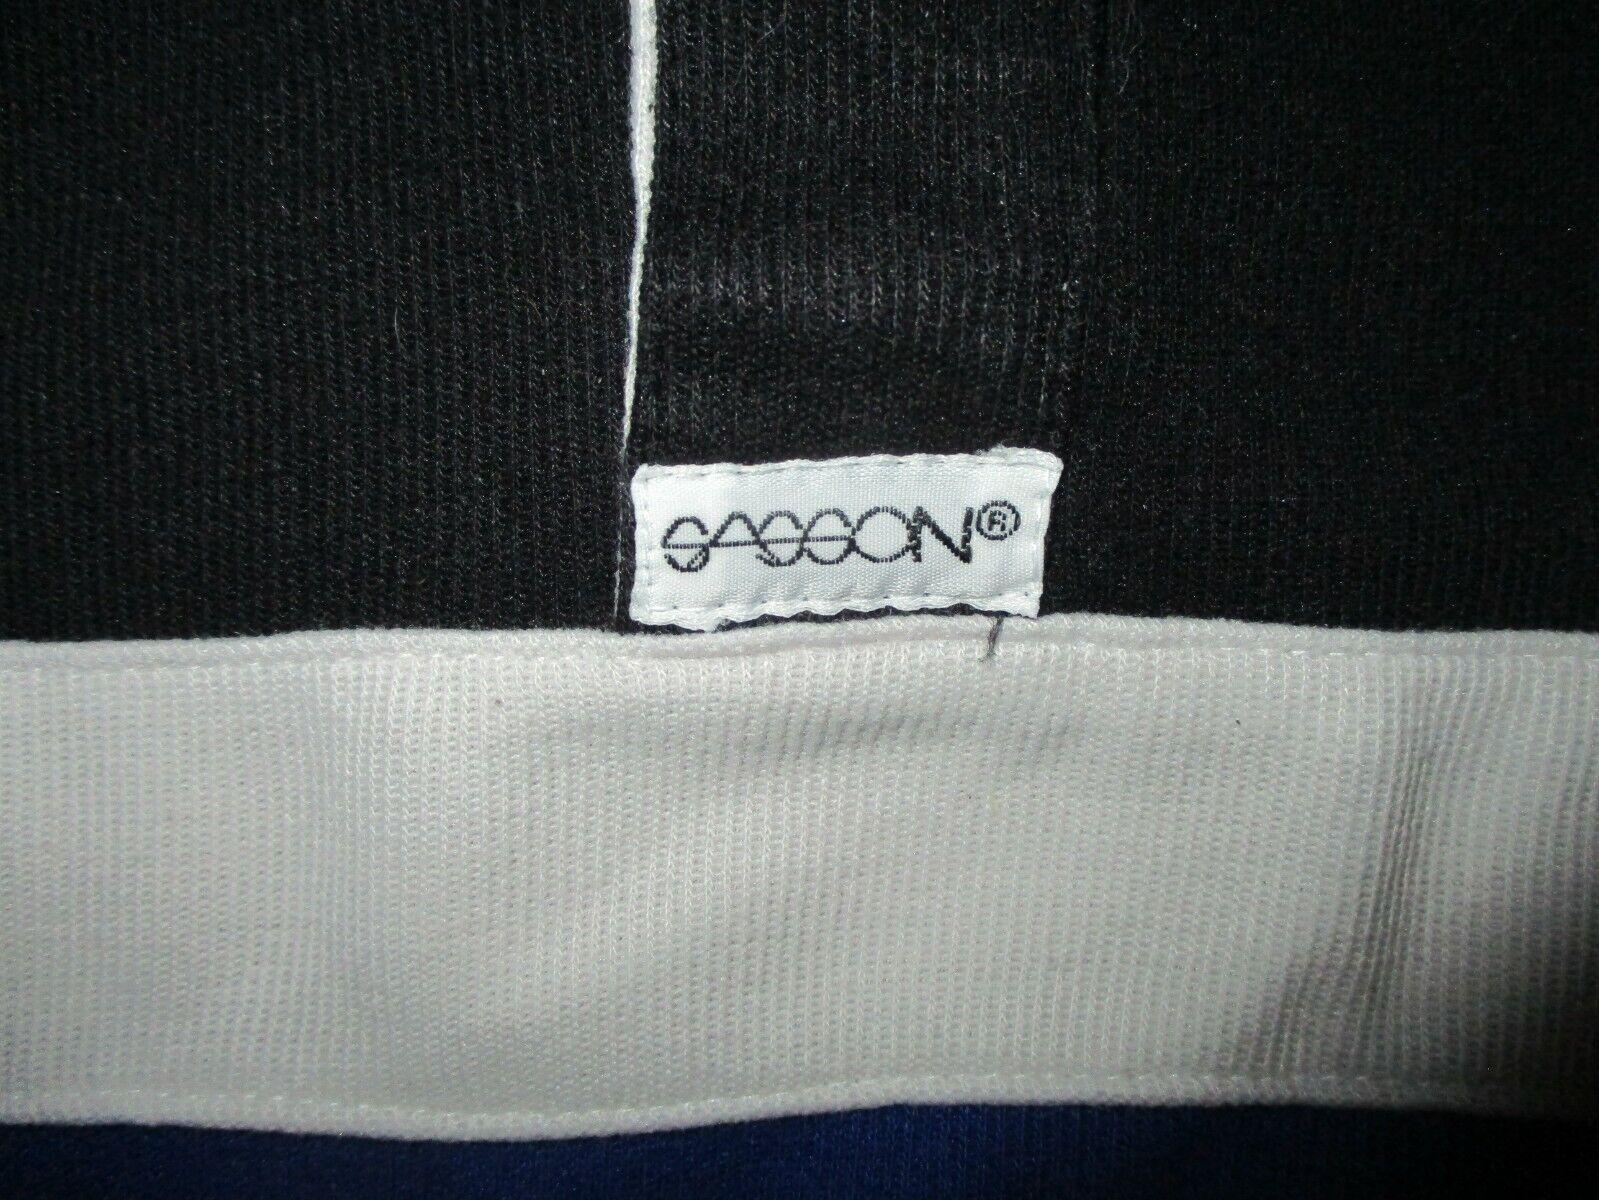 vtg 70s 80s SASSON BRAND POLO SHIRT Short Sleeve … - image 3